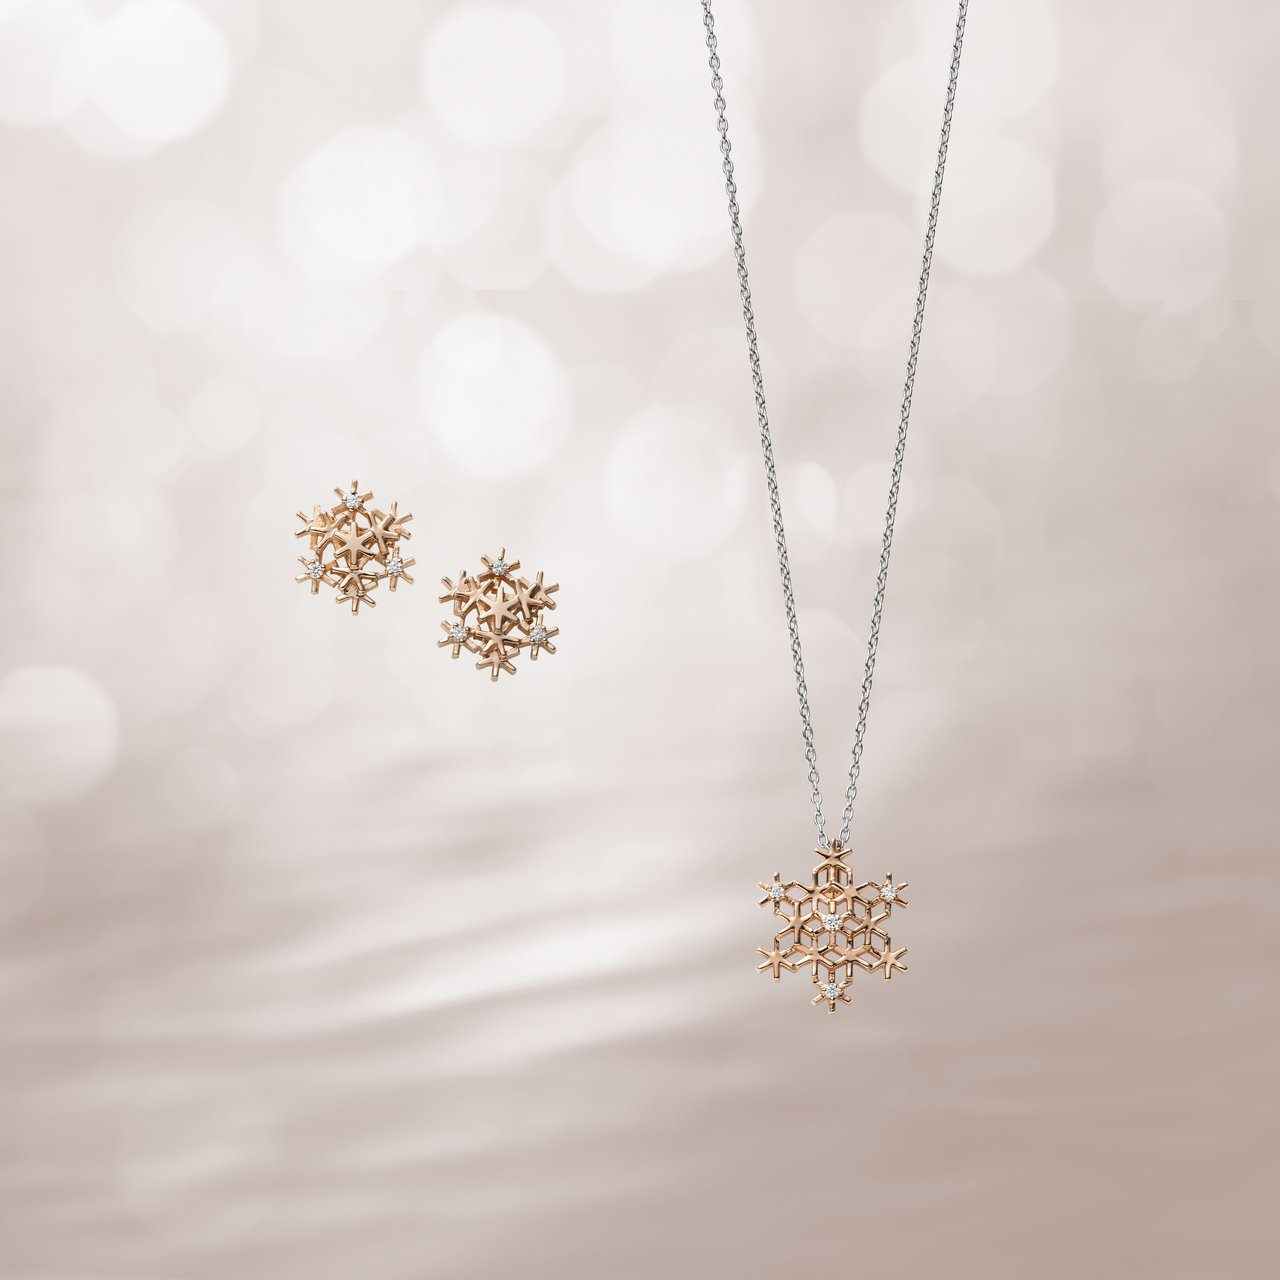 MIKIMOTO 18K粉紅金鑽石雪花耳環及墜鍊。圖/MIKIMOTO提供